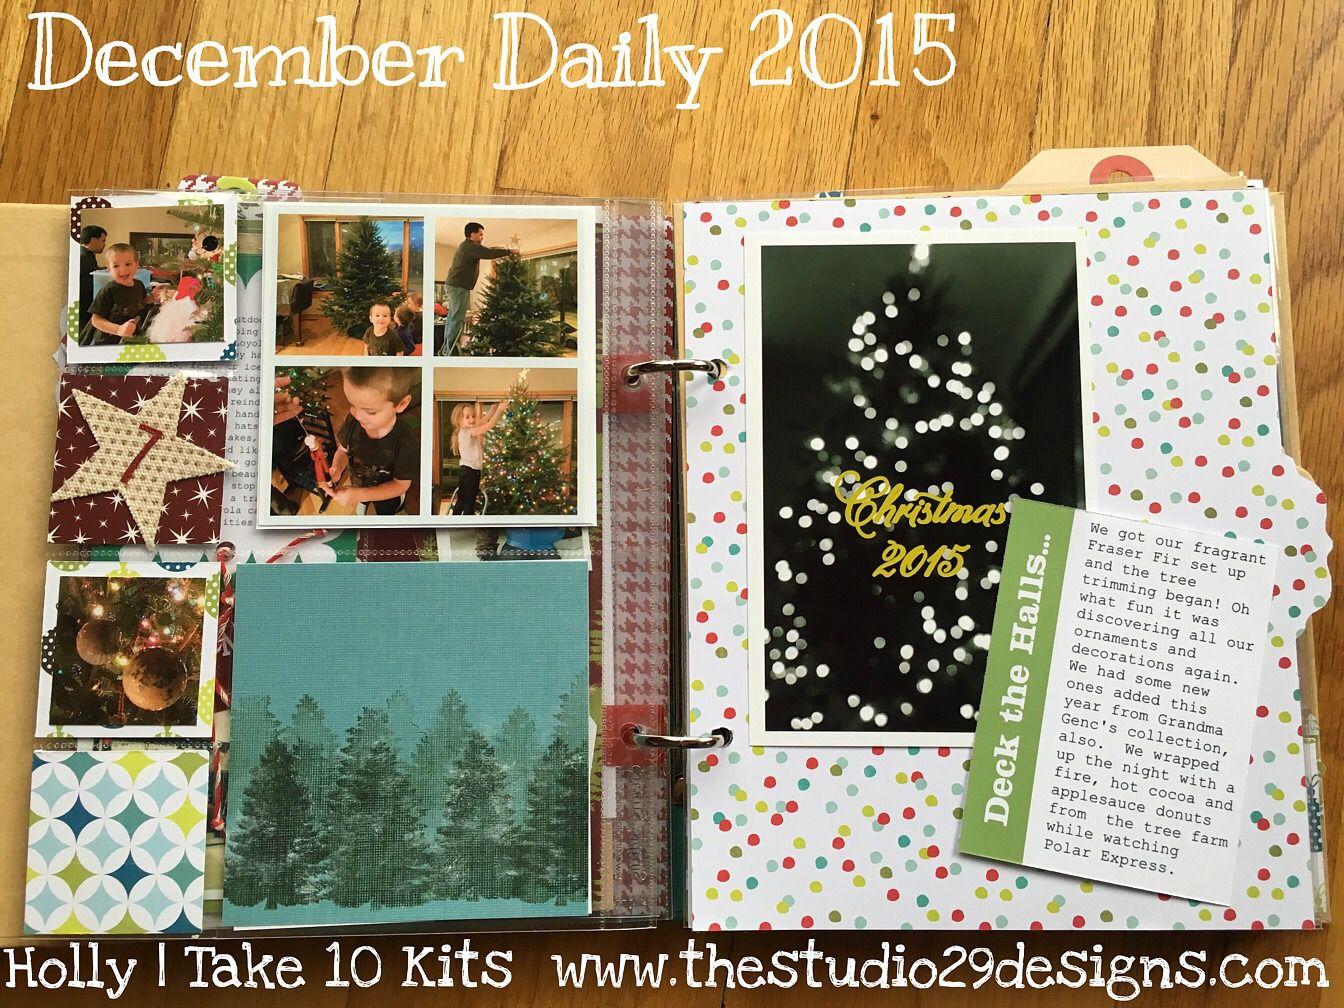 Holly   Take10Kits   www.thestudio29designs.com